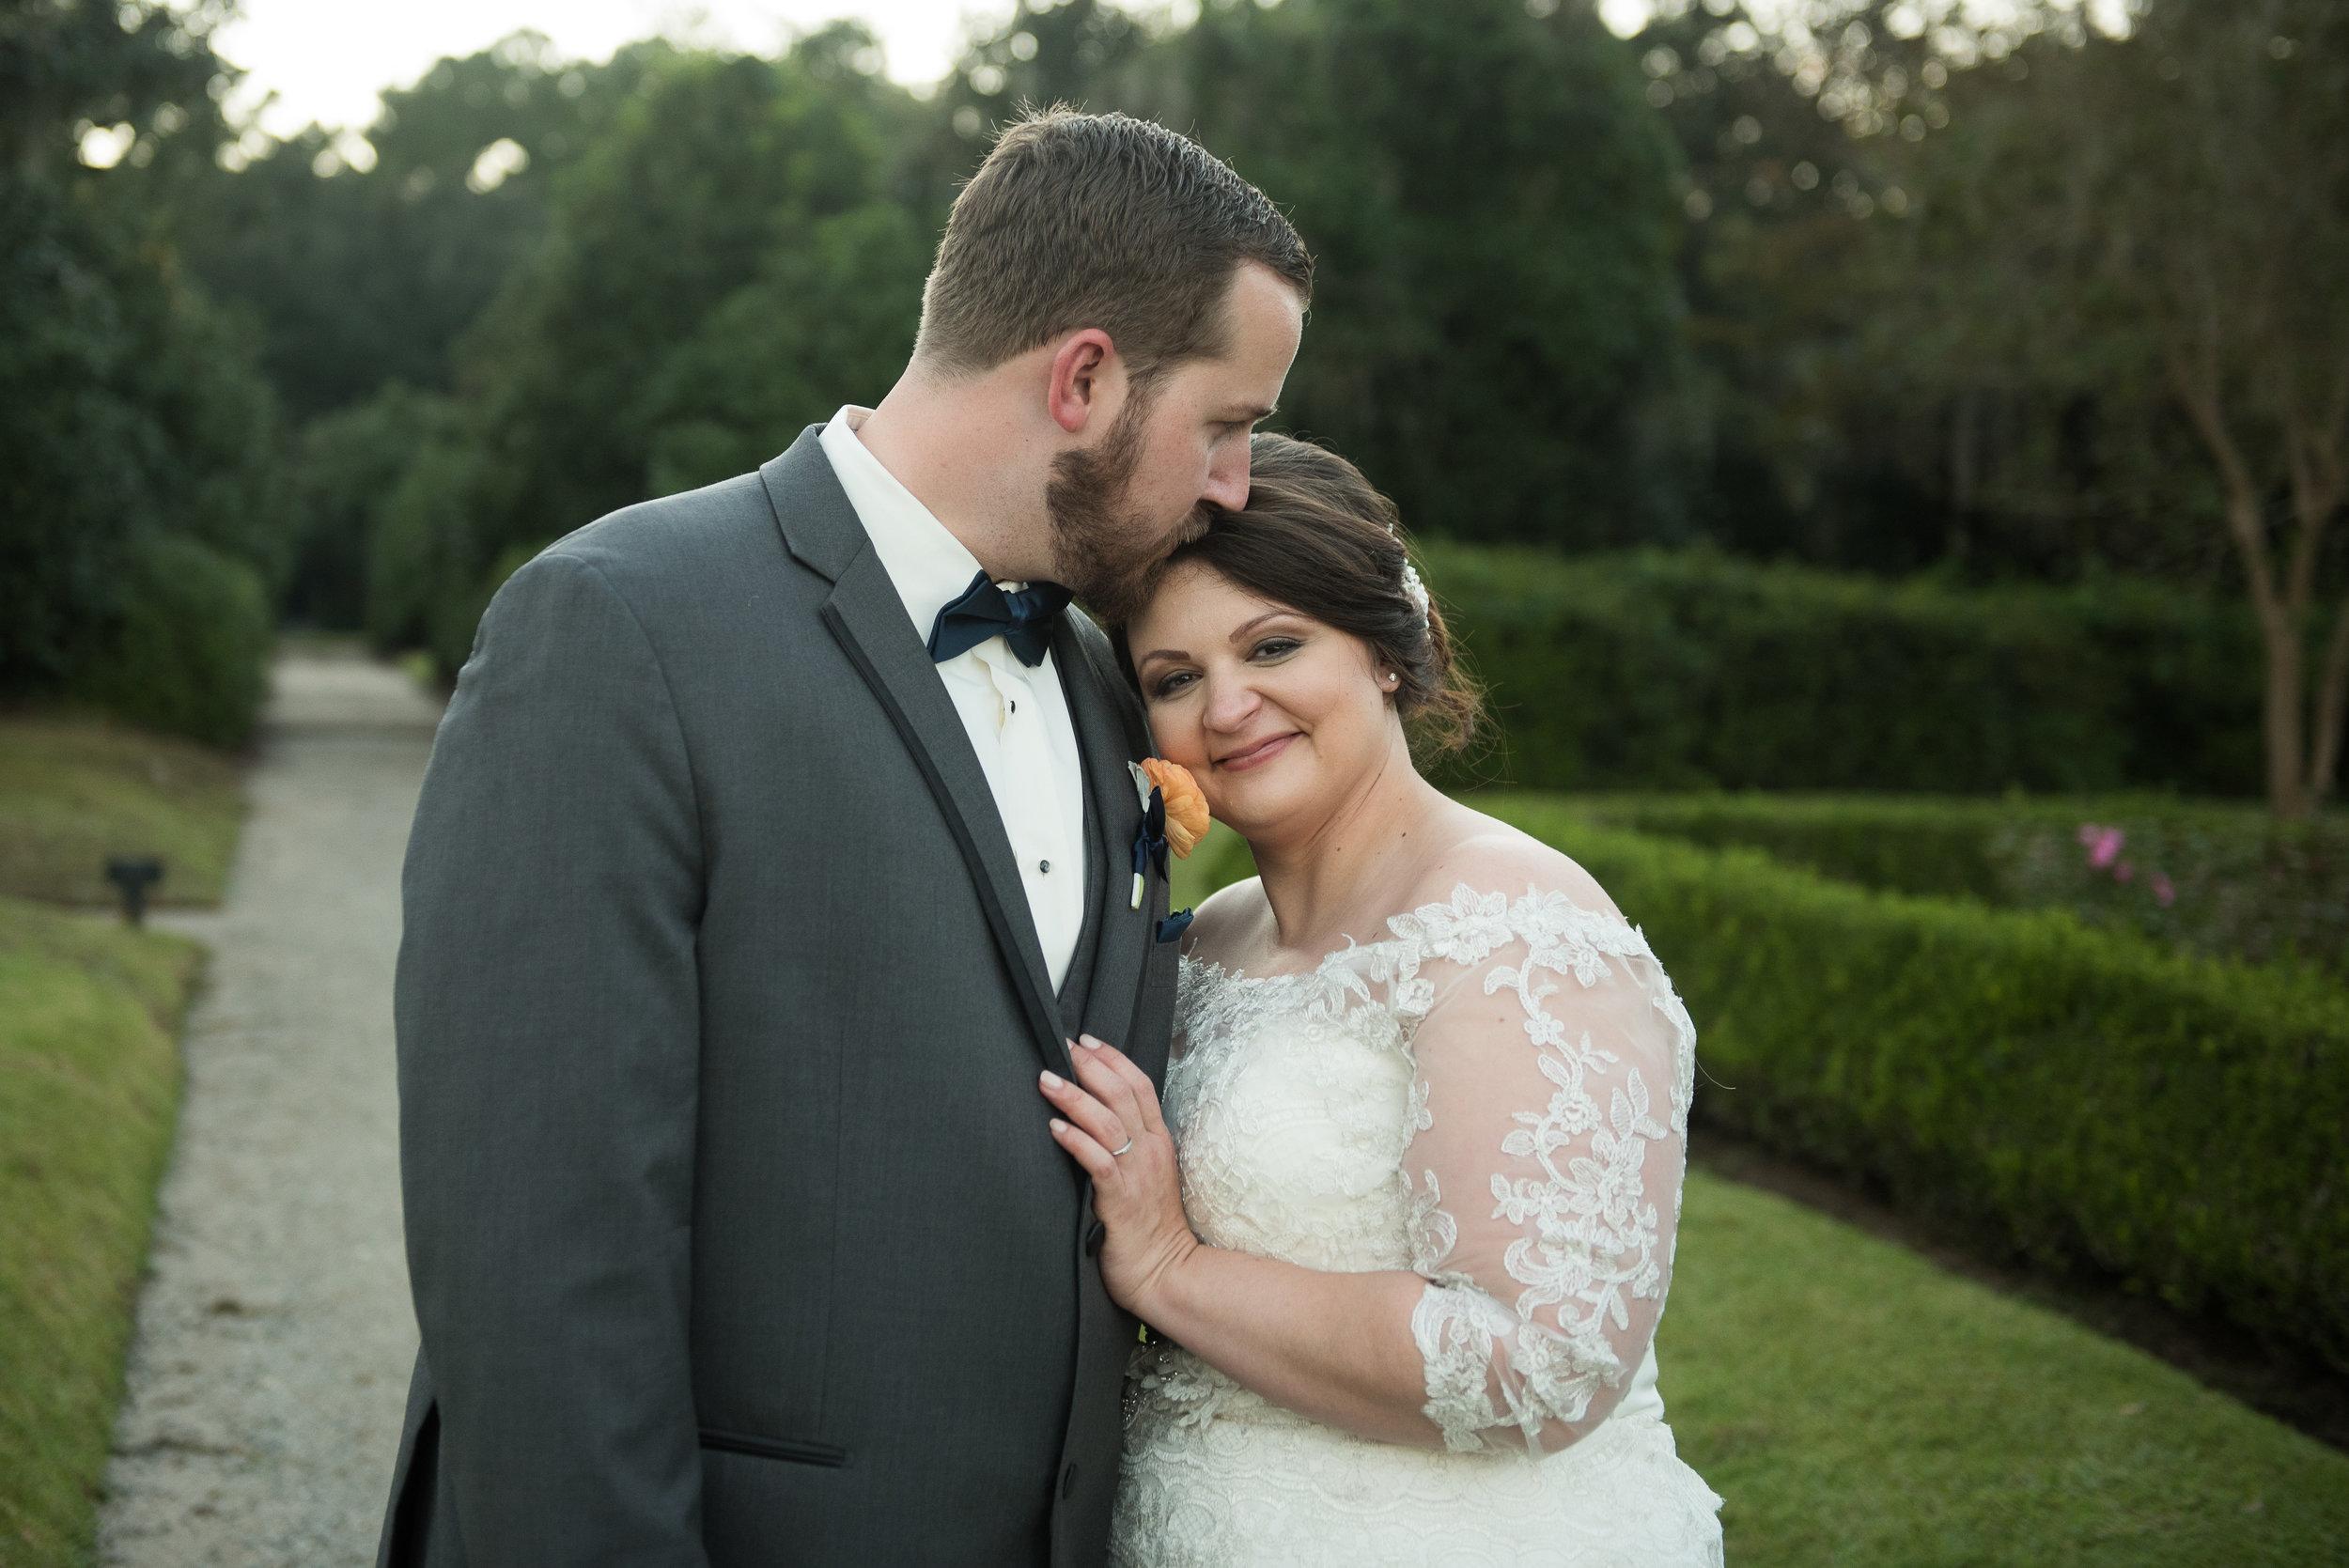 Mezzetti_Rutherford_Reese_Moore_Weddings_RTM5344.jpg